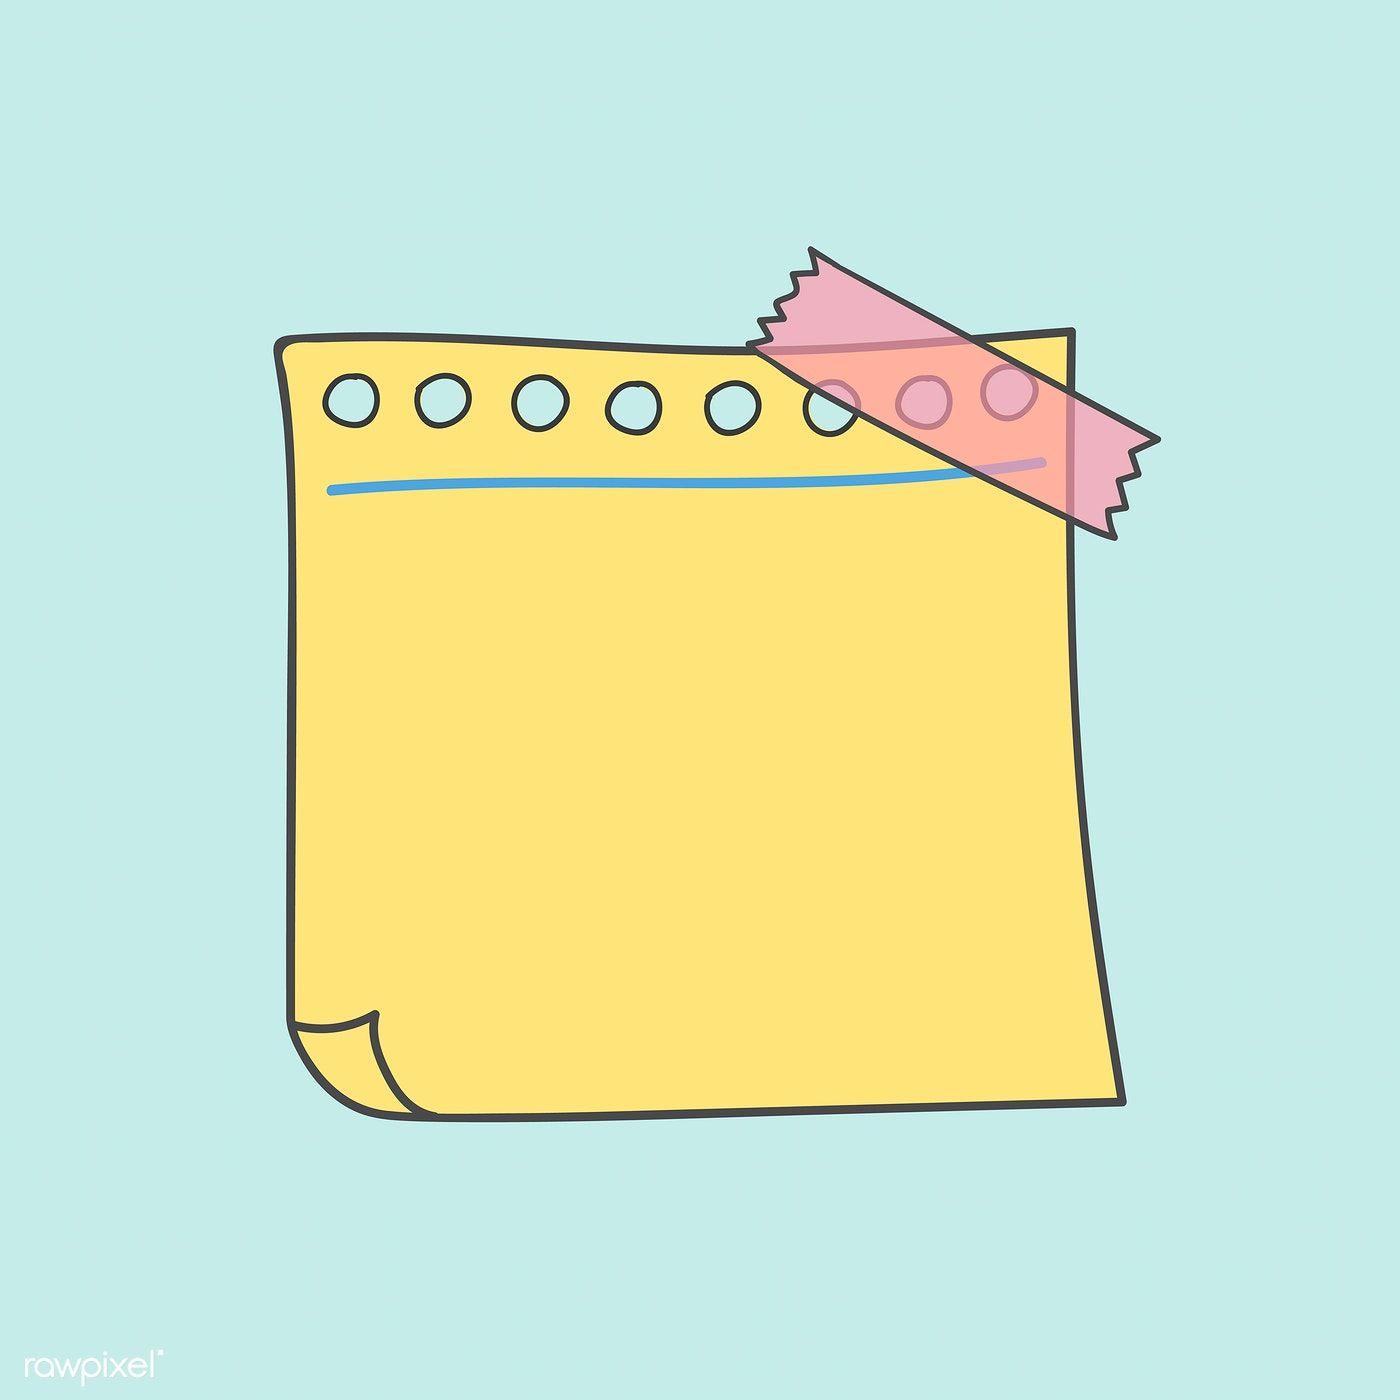 Download Premium Vector Of Blank Yellow Note Paper Vector 553845 Fondos Para Blog Titulos Bonitos Para Apuntes Fondos Para Textos